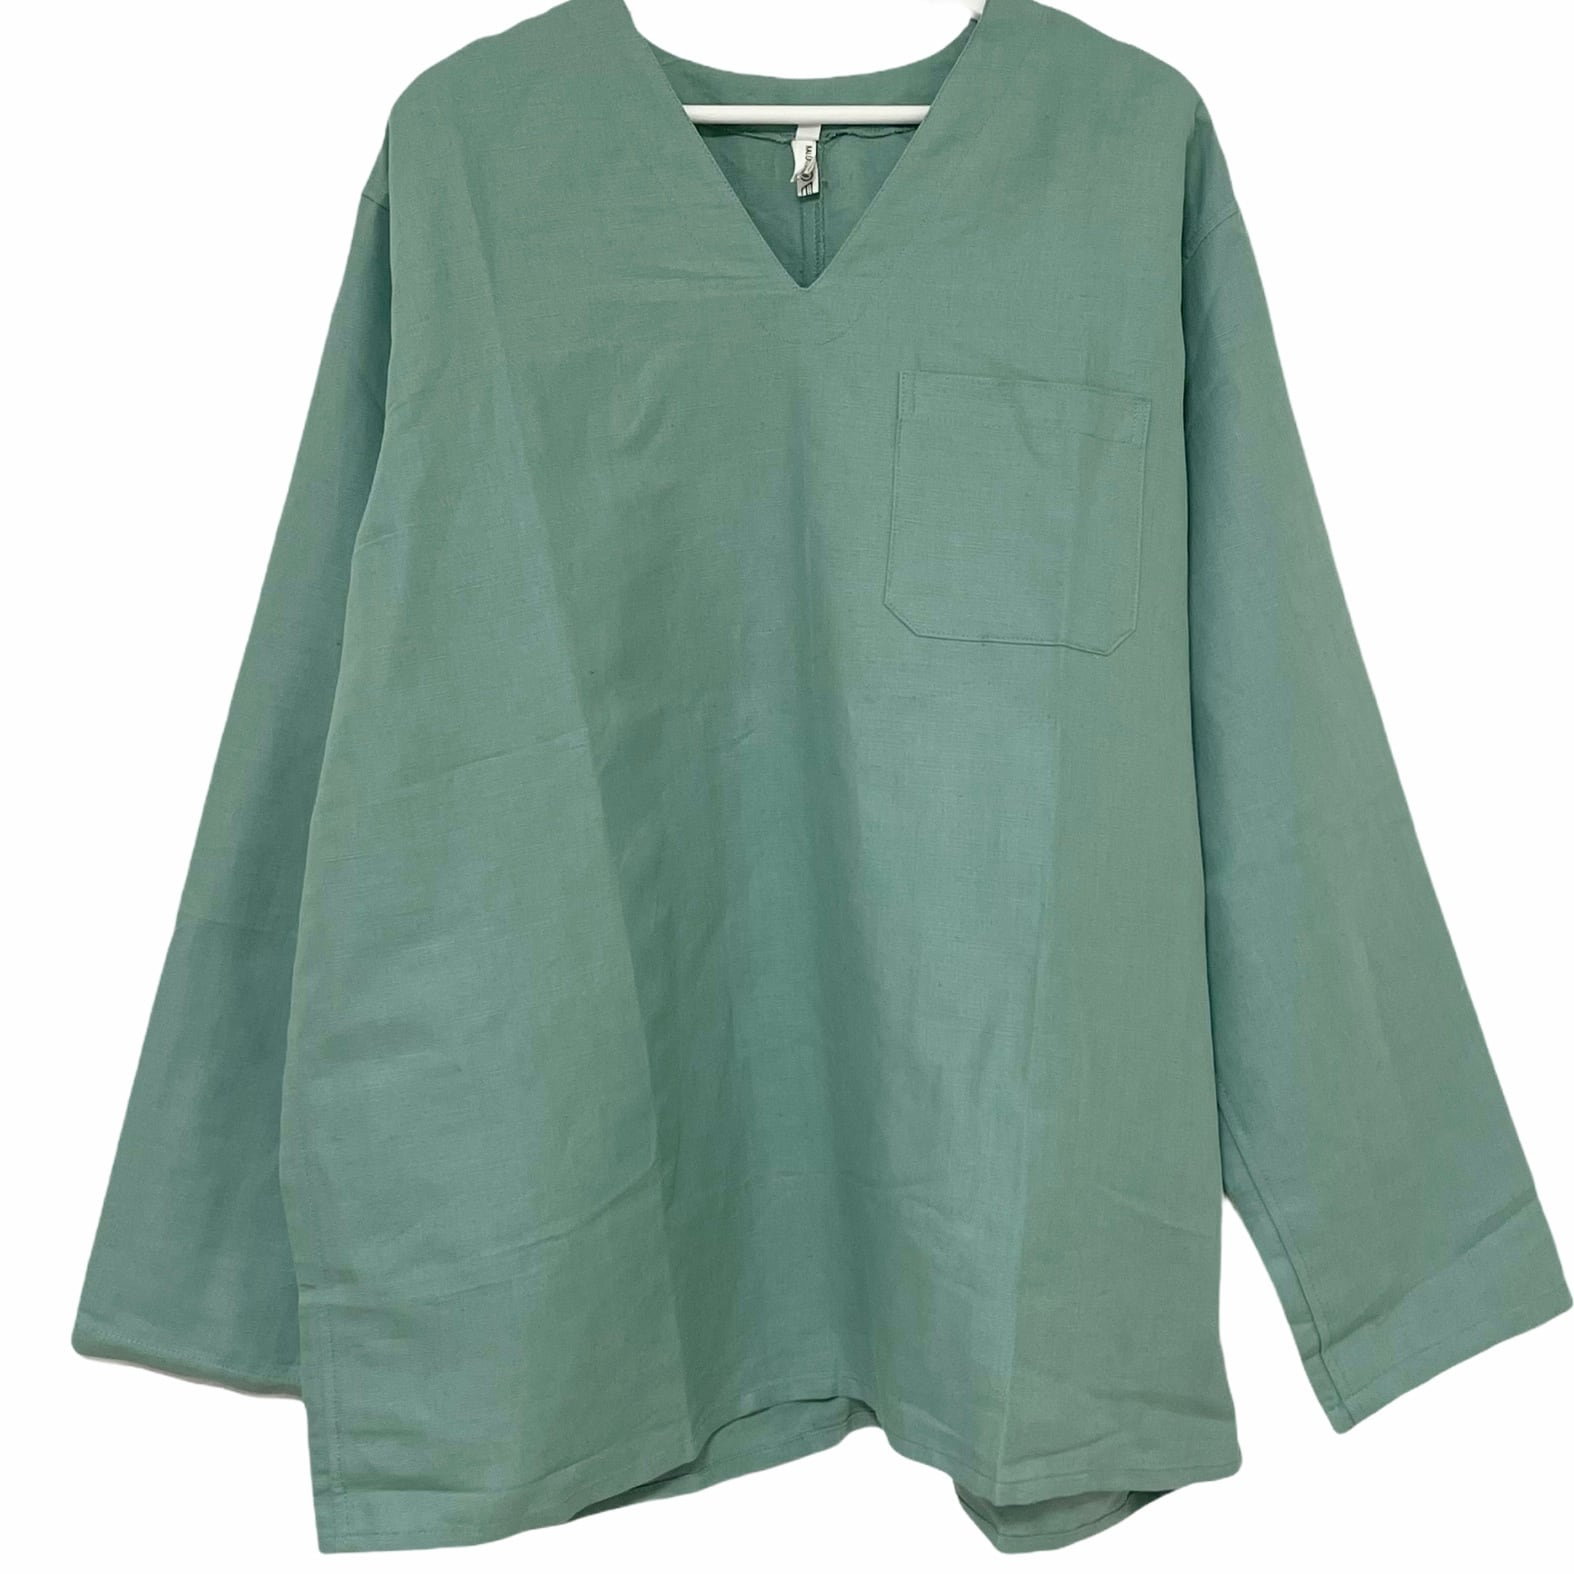 Dead Stock Hungarian ARMY Linen Pullover Sleeping Shirt